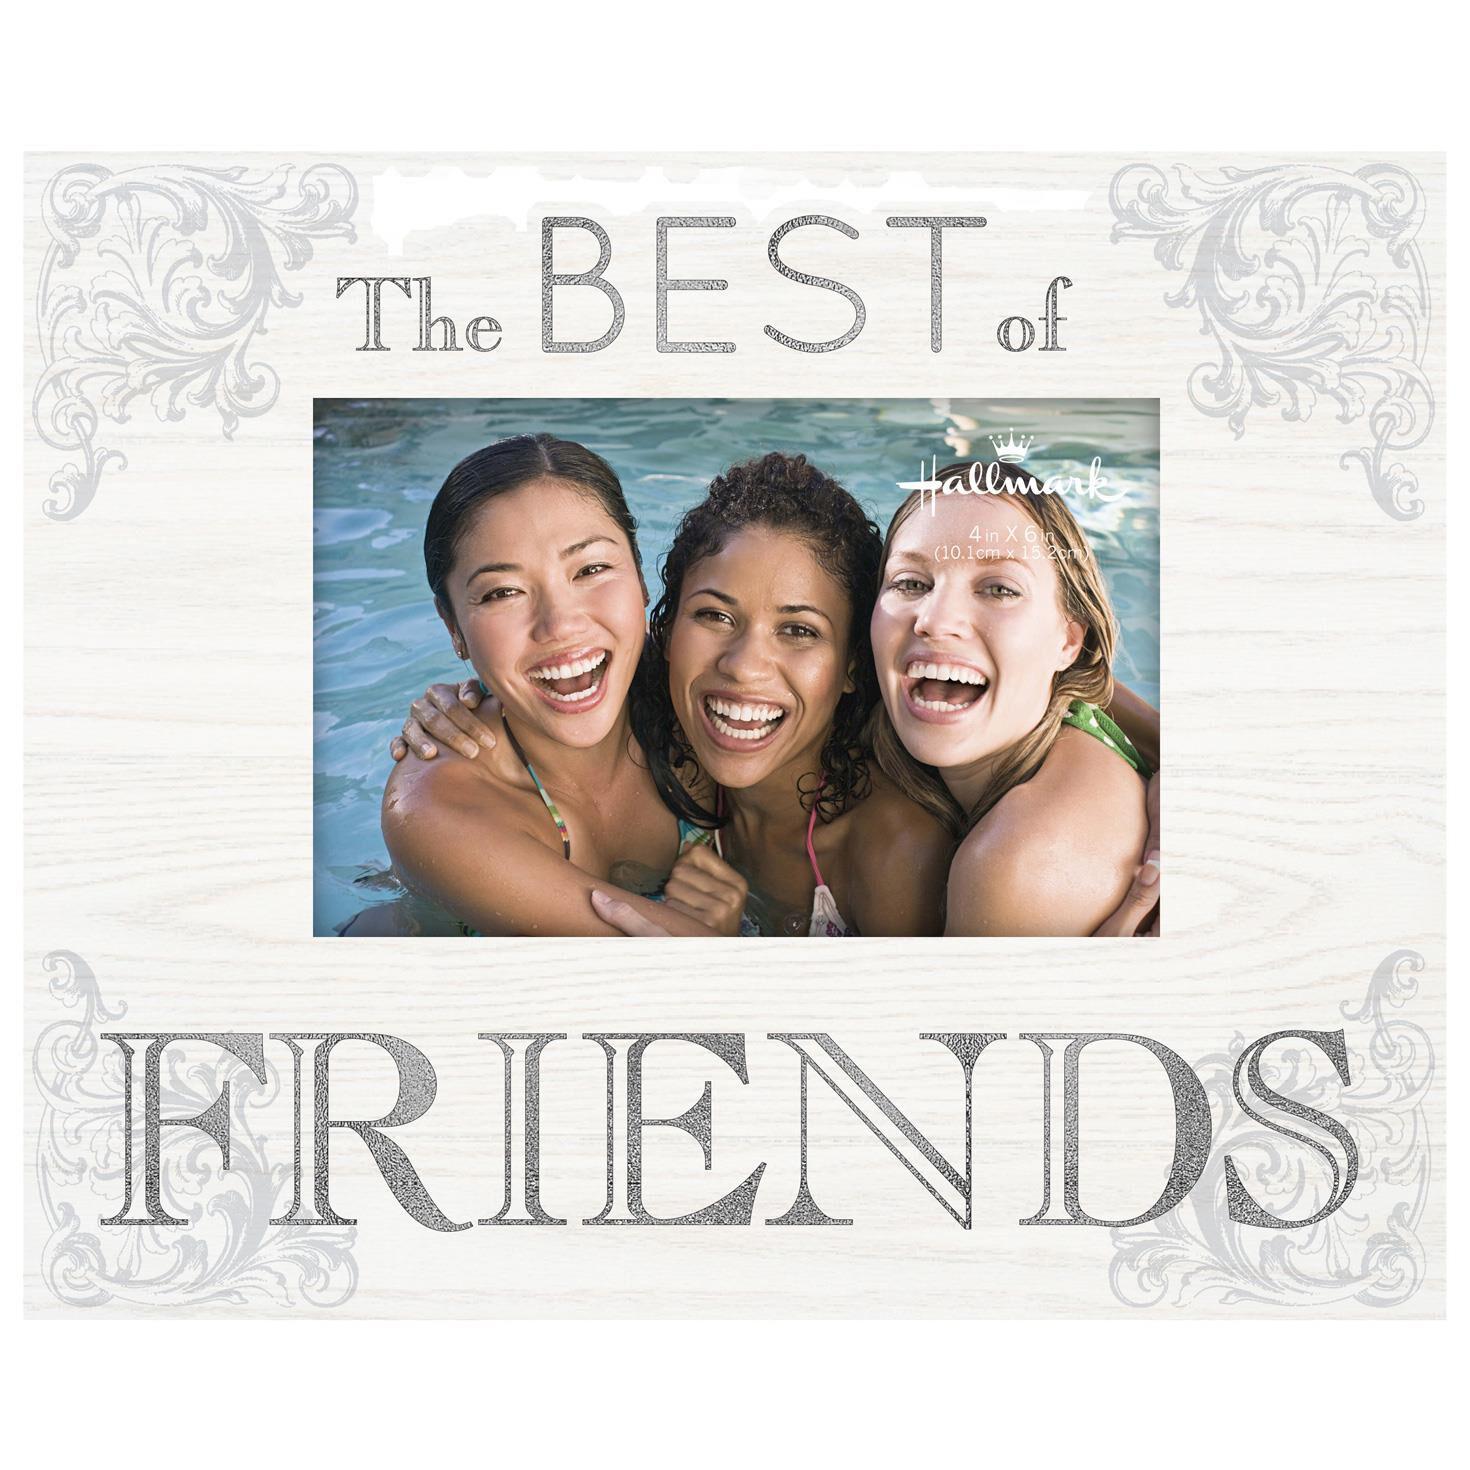 Best of Friends Wood Photo Frame, 4x6 - Picture Frames - Hallmark